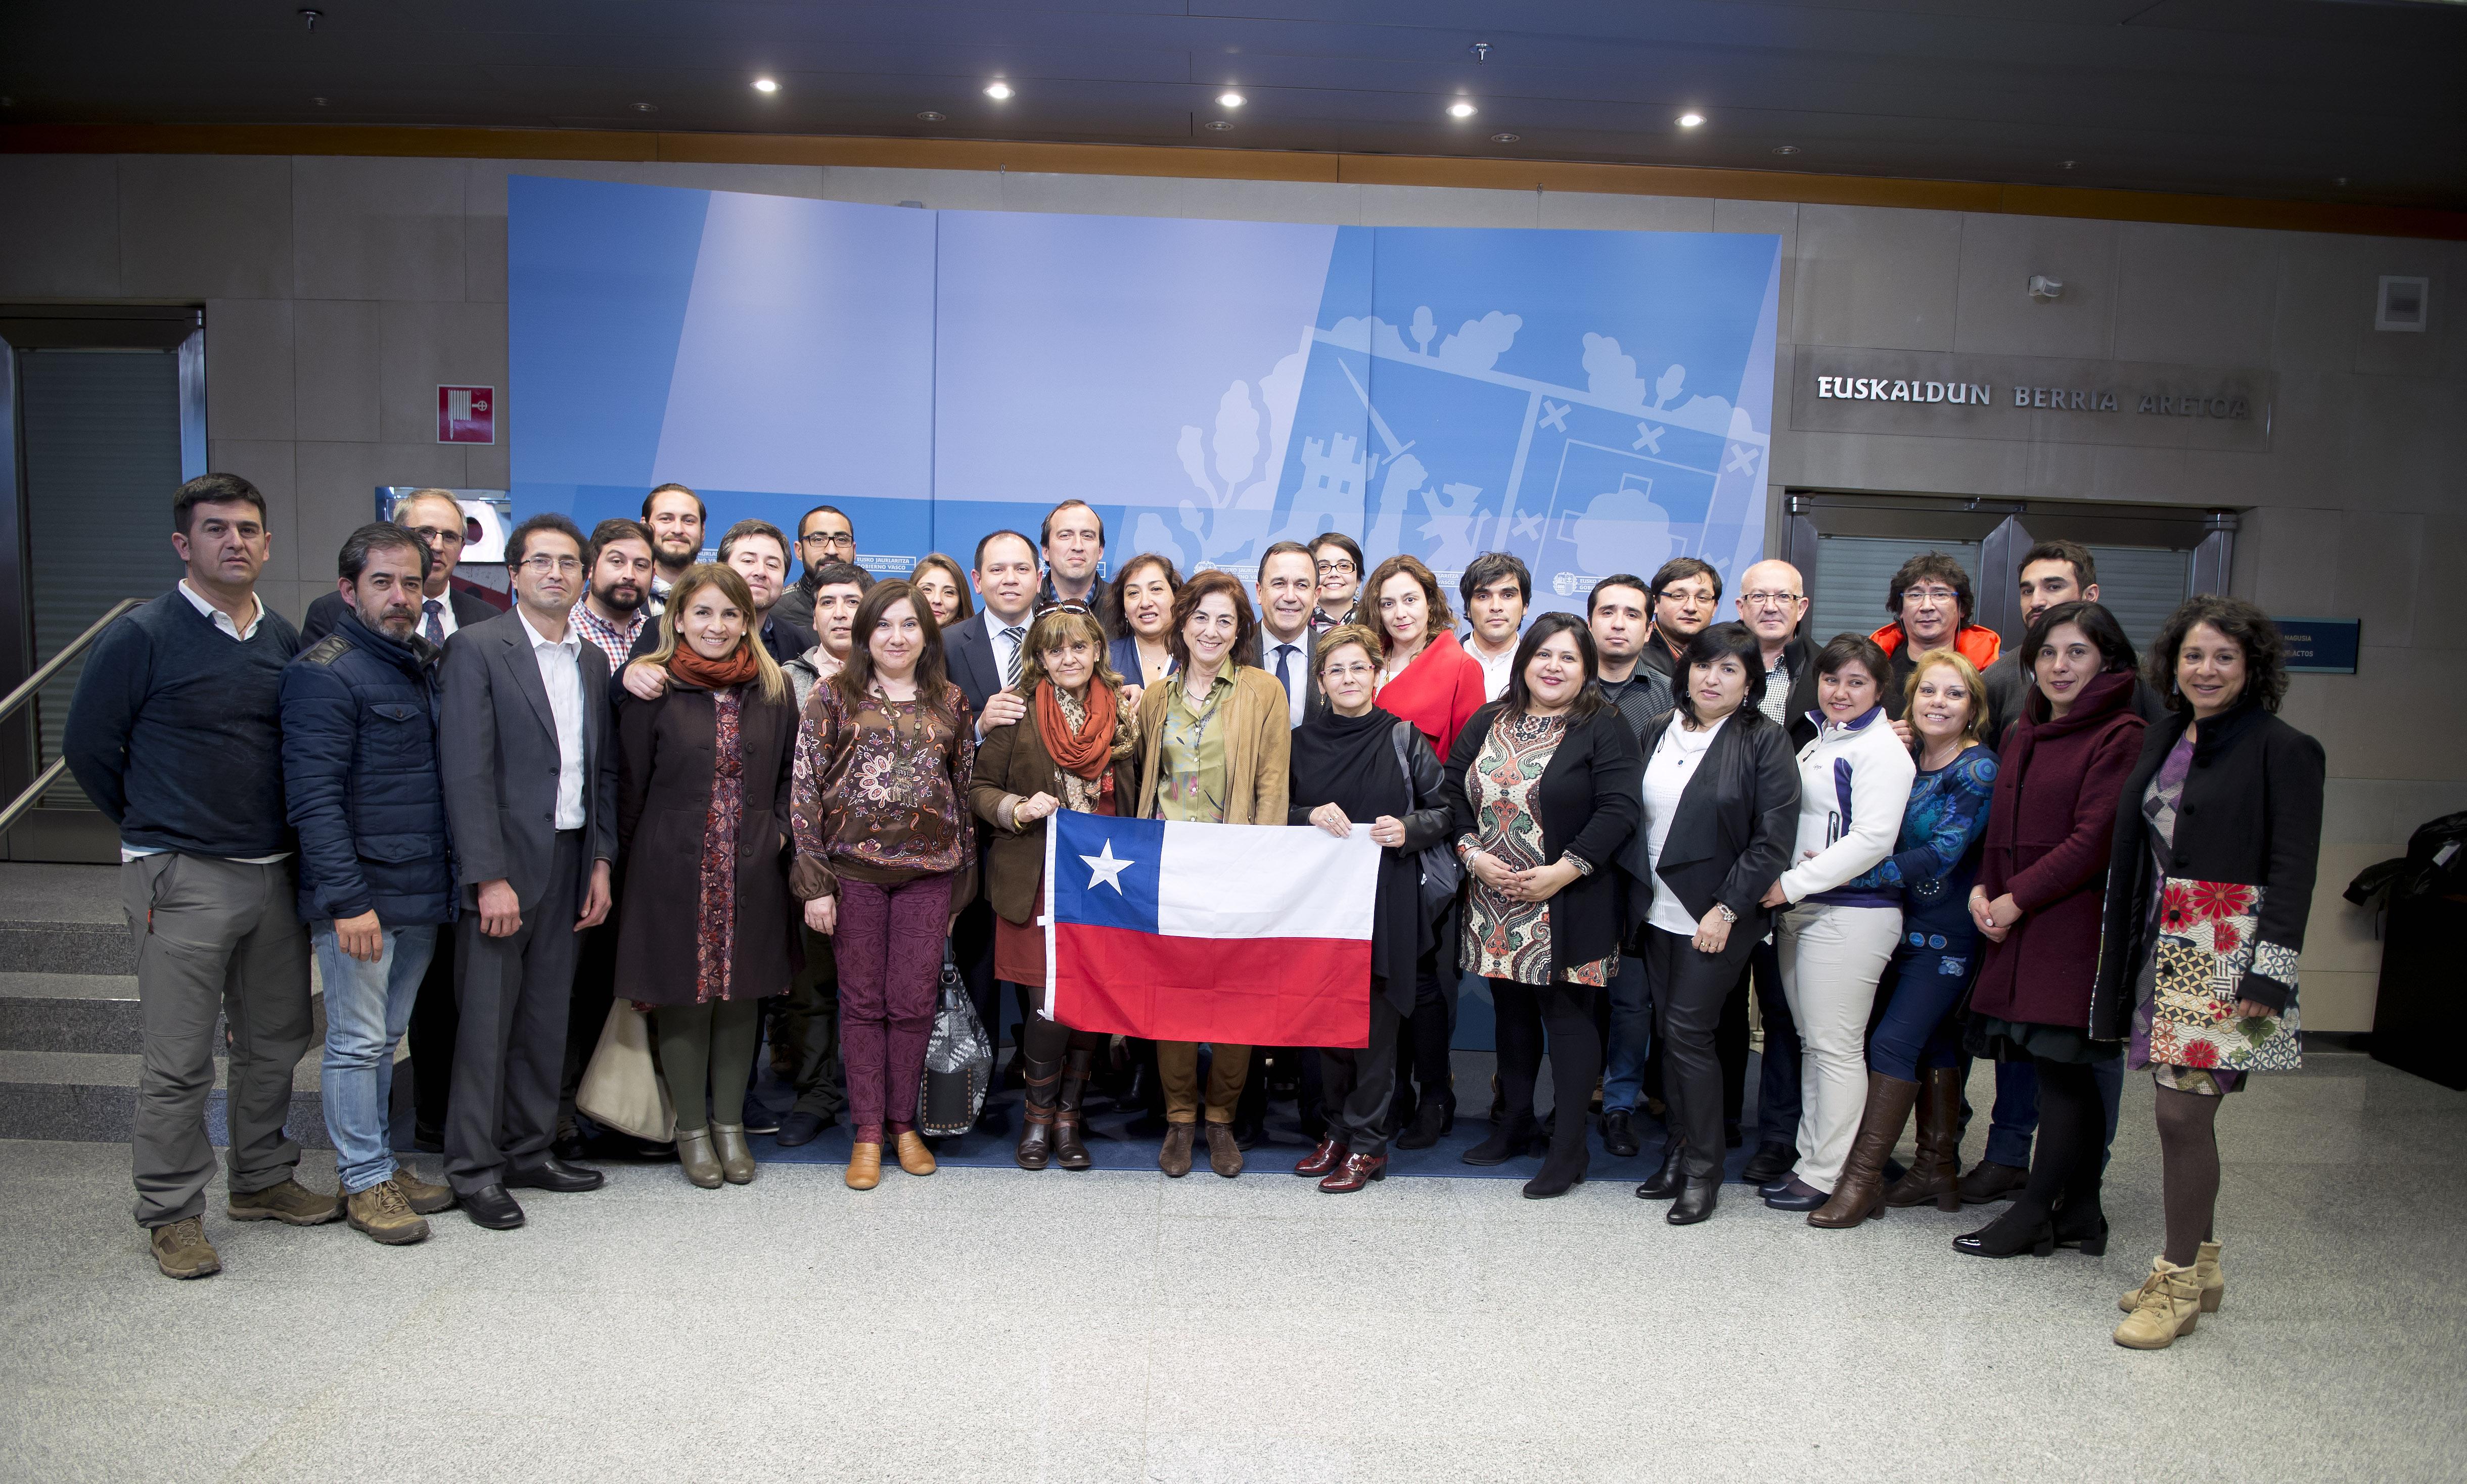 2017_02_20_uriarte_chilenos_fp_08.jpg